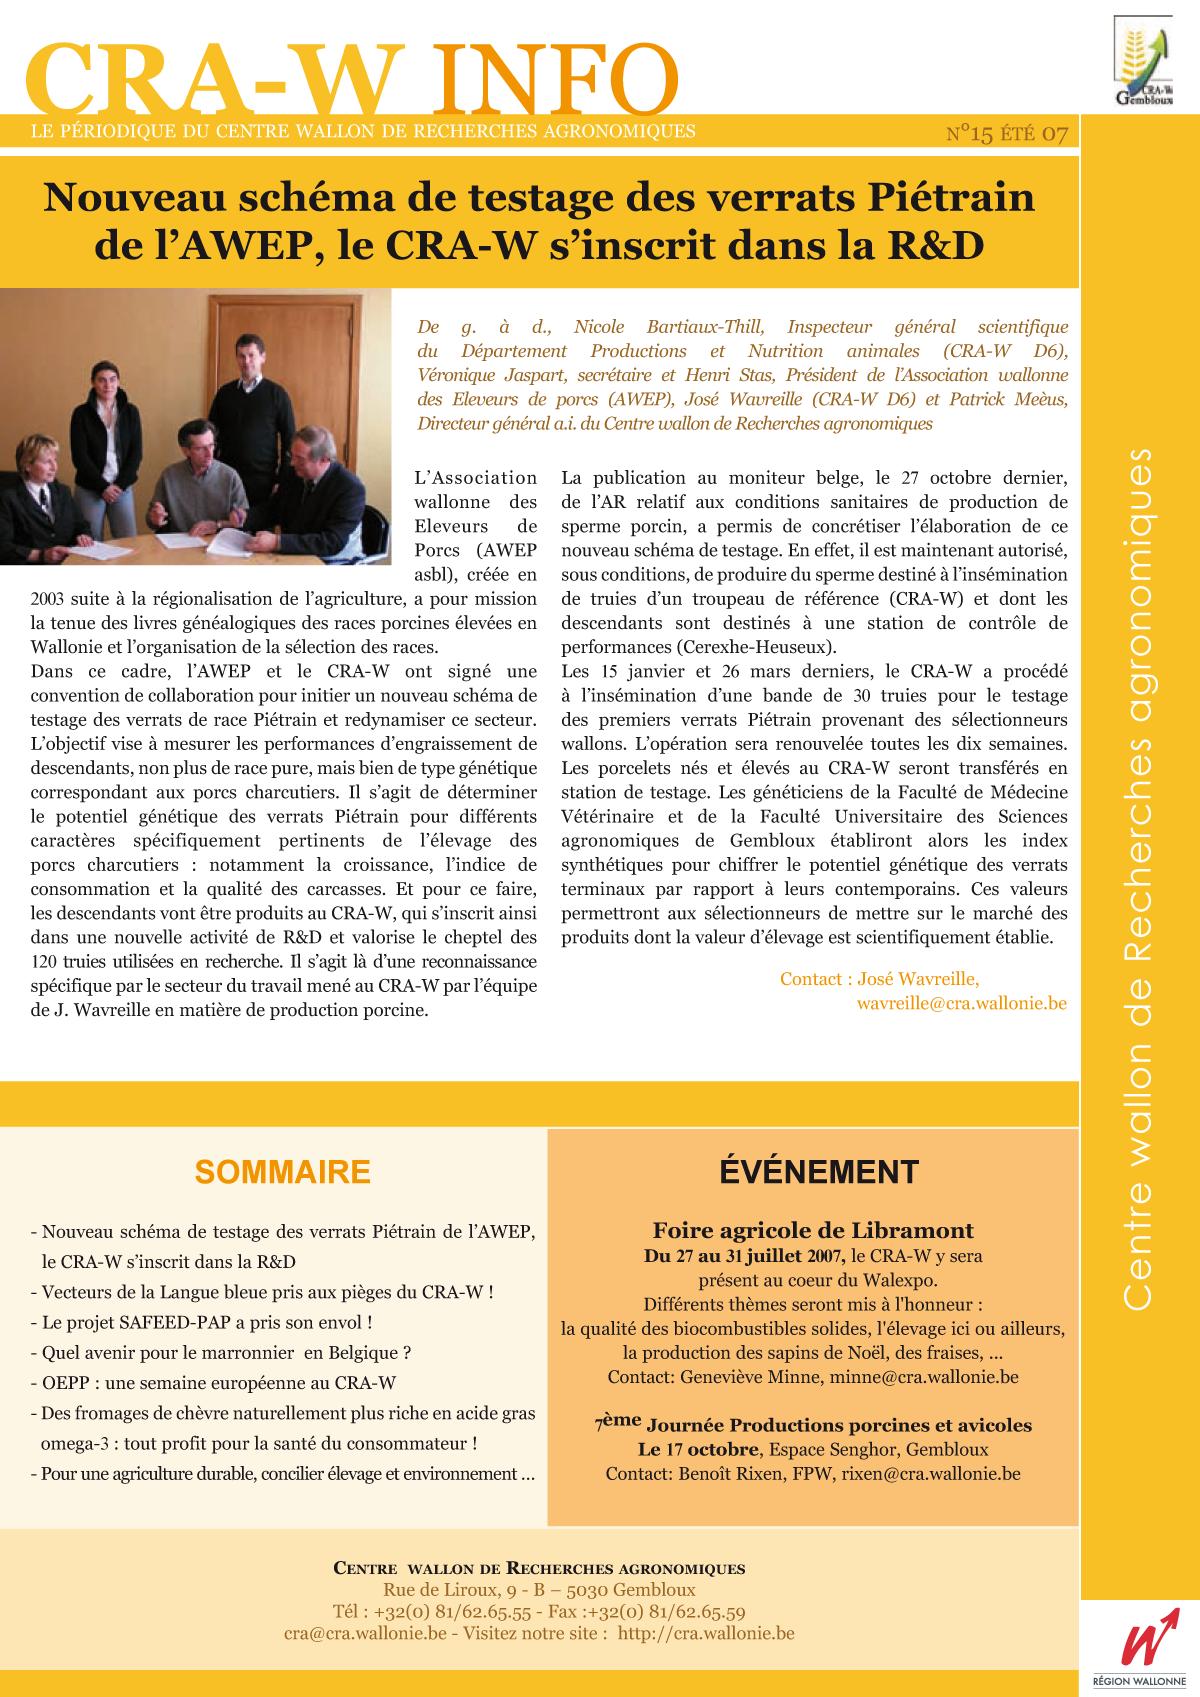 CRAW info n° 15